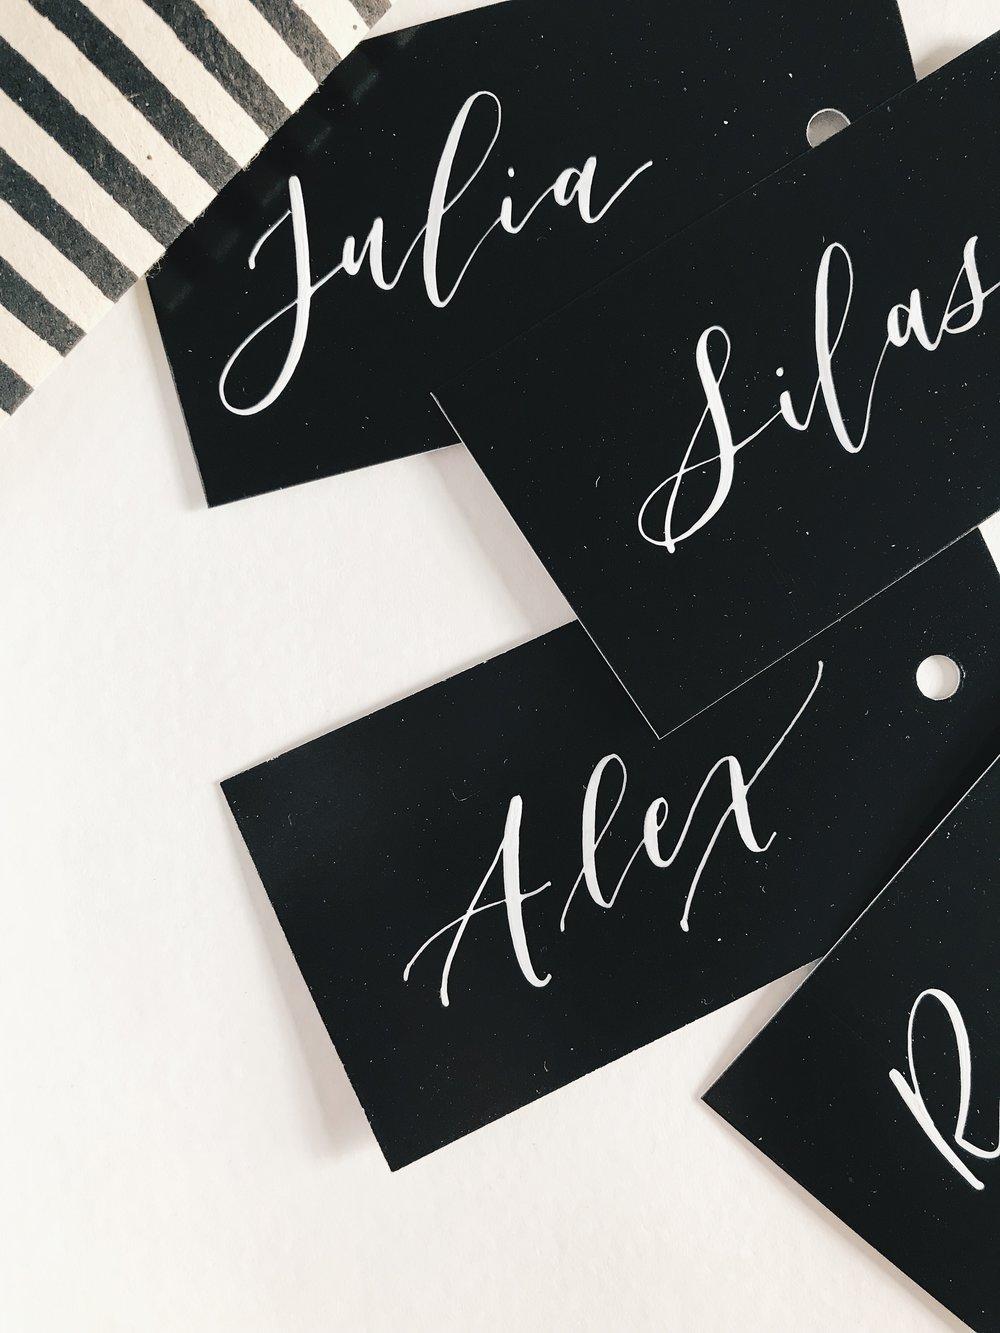 heylux_calligraphy_gifttags_blackandwhite.JPG